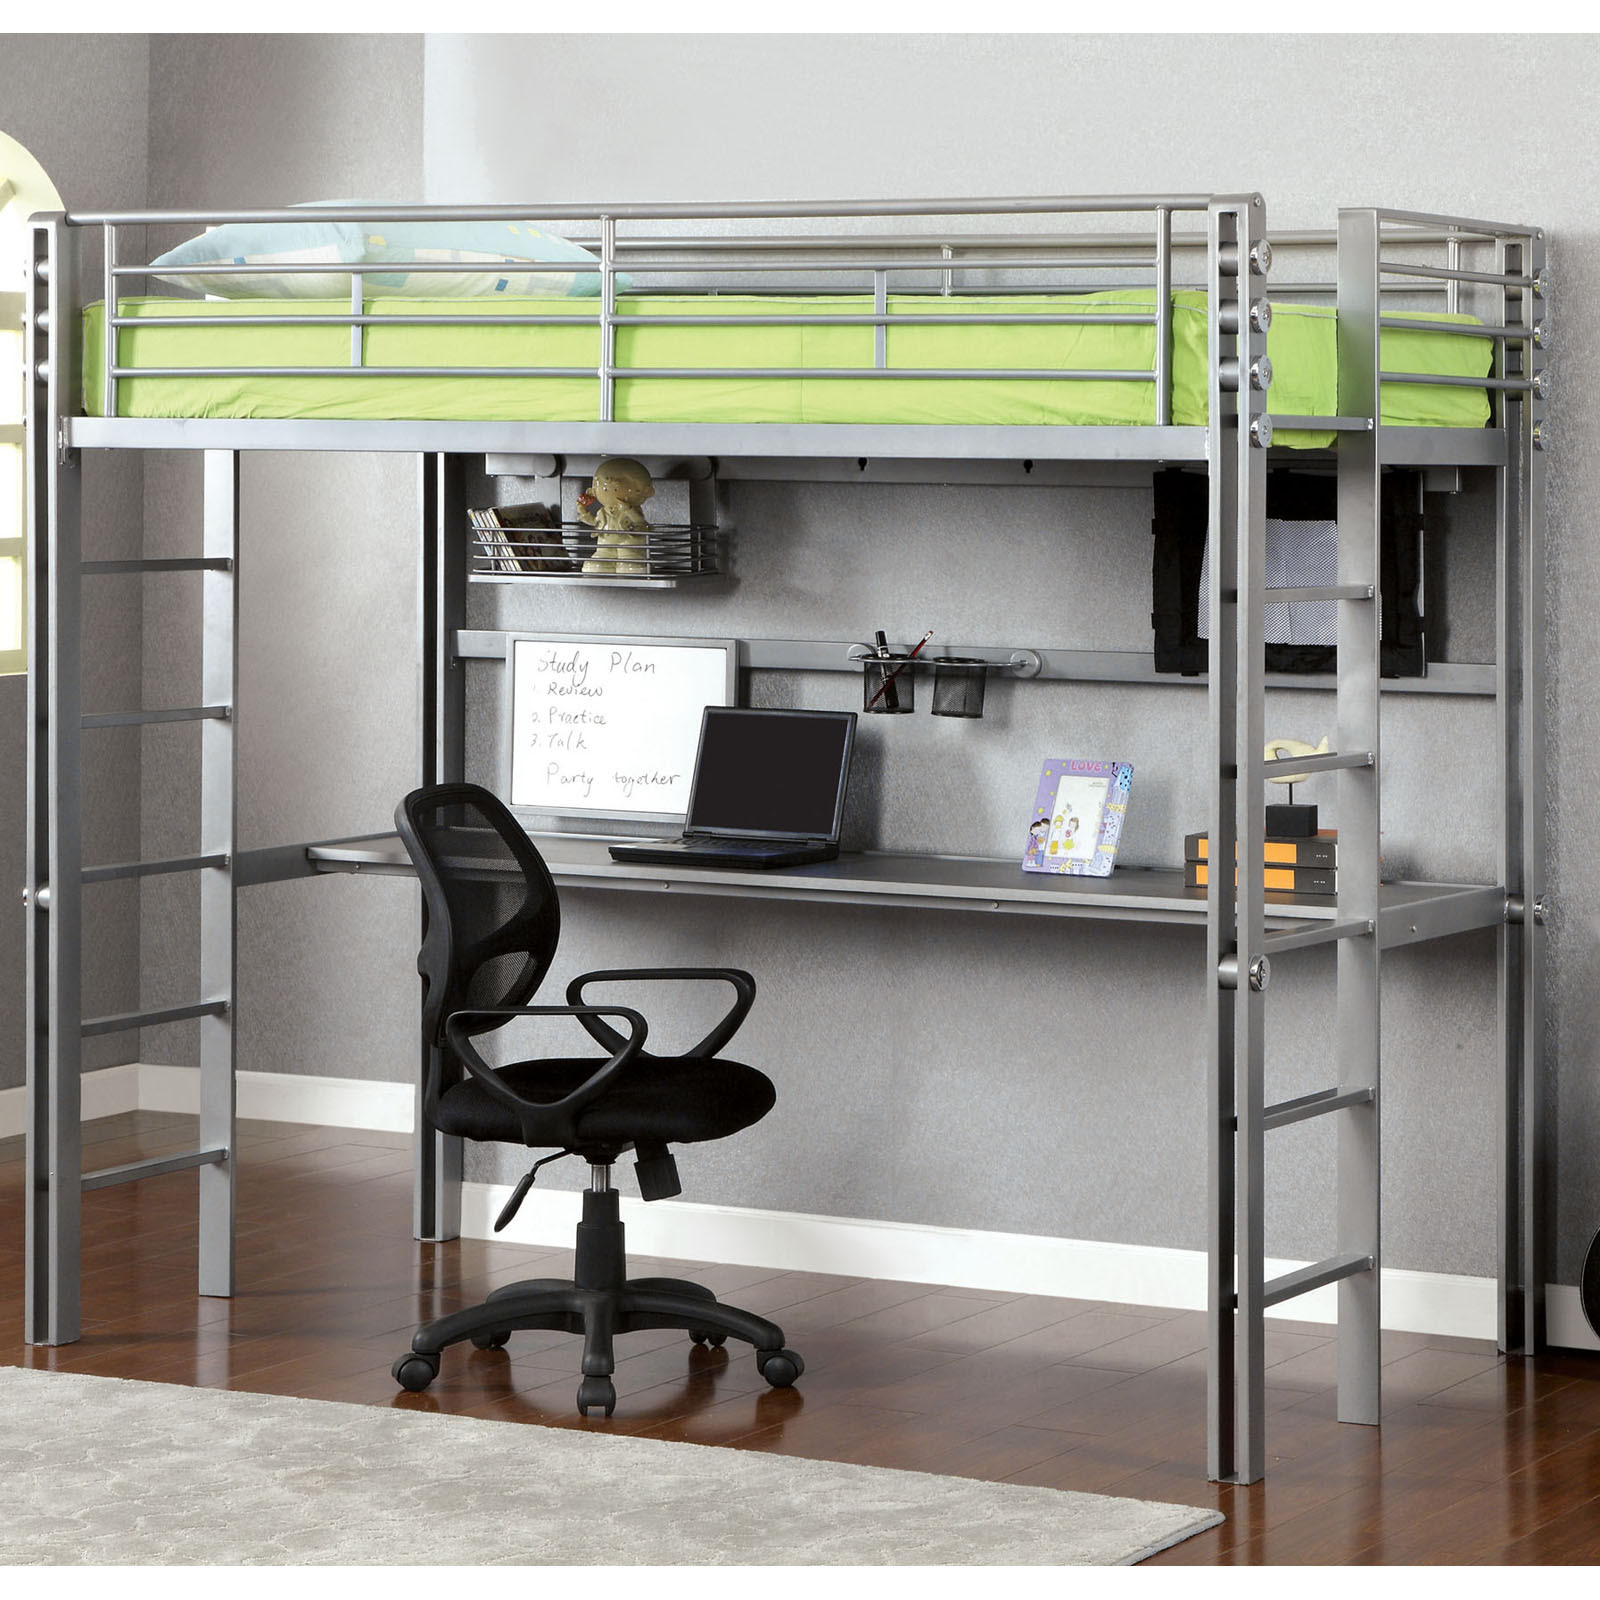 Aldie Twin Loft Bed with Workstation  Silver\/Black at Hayneedle